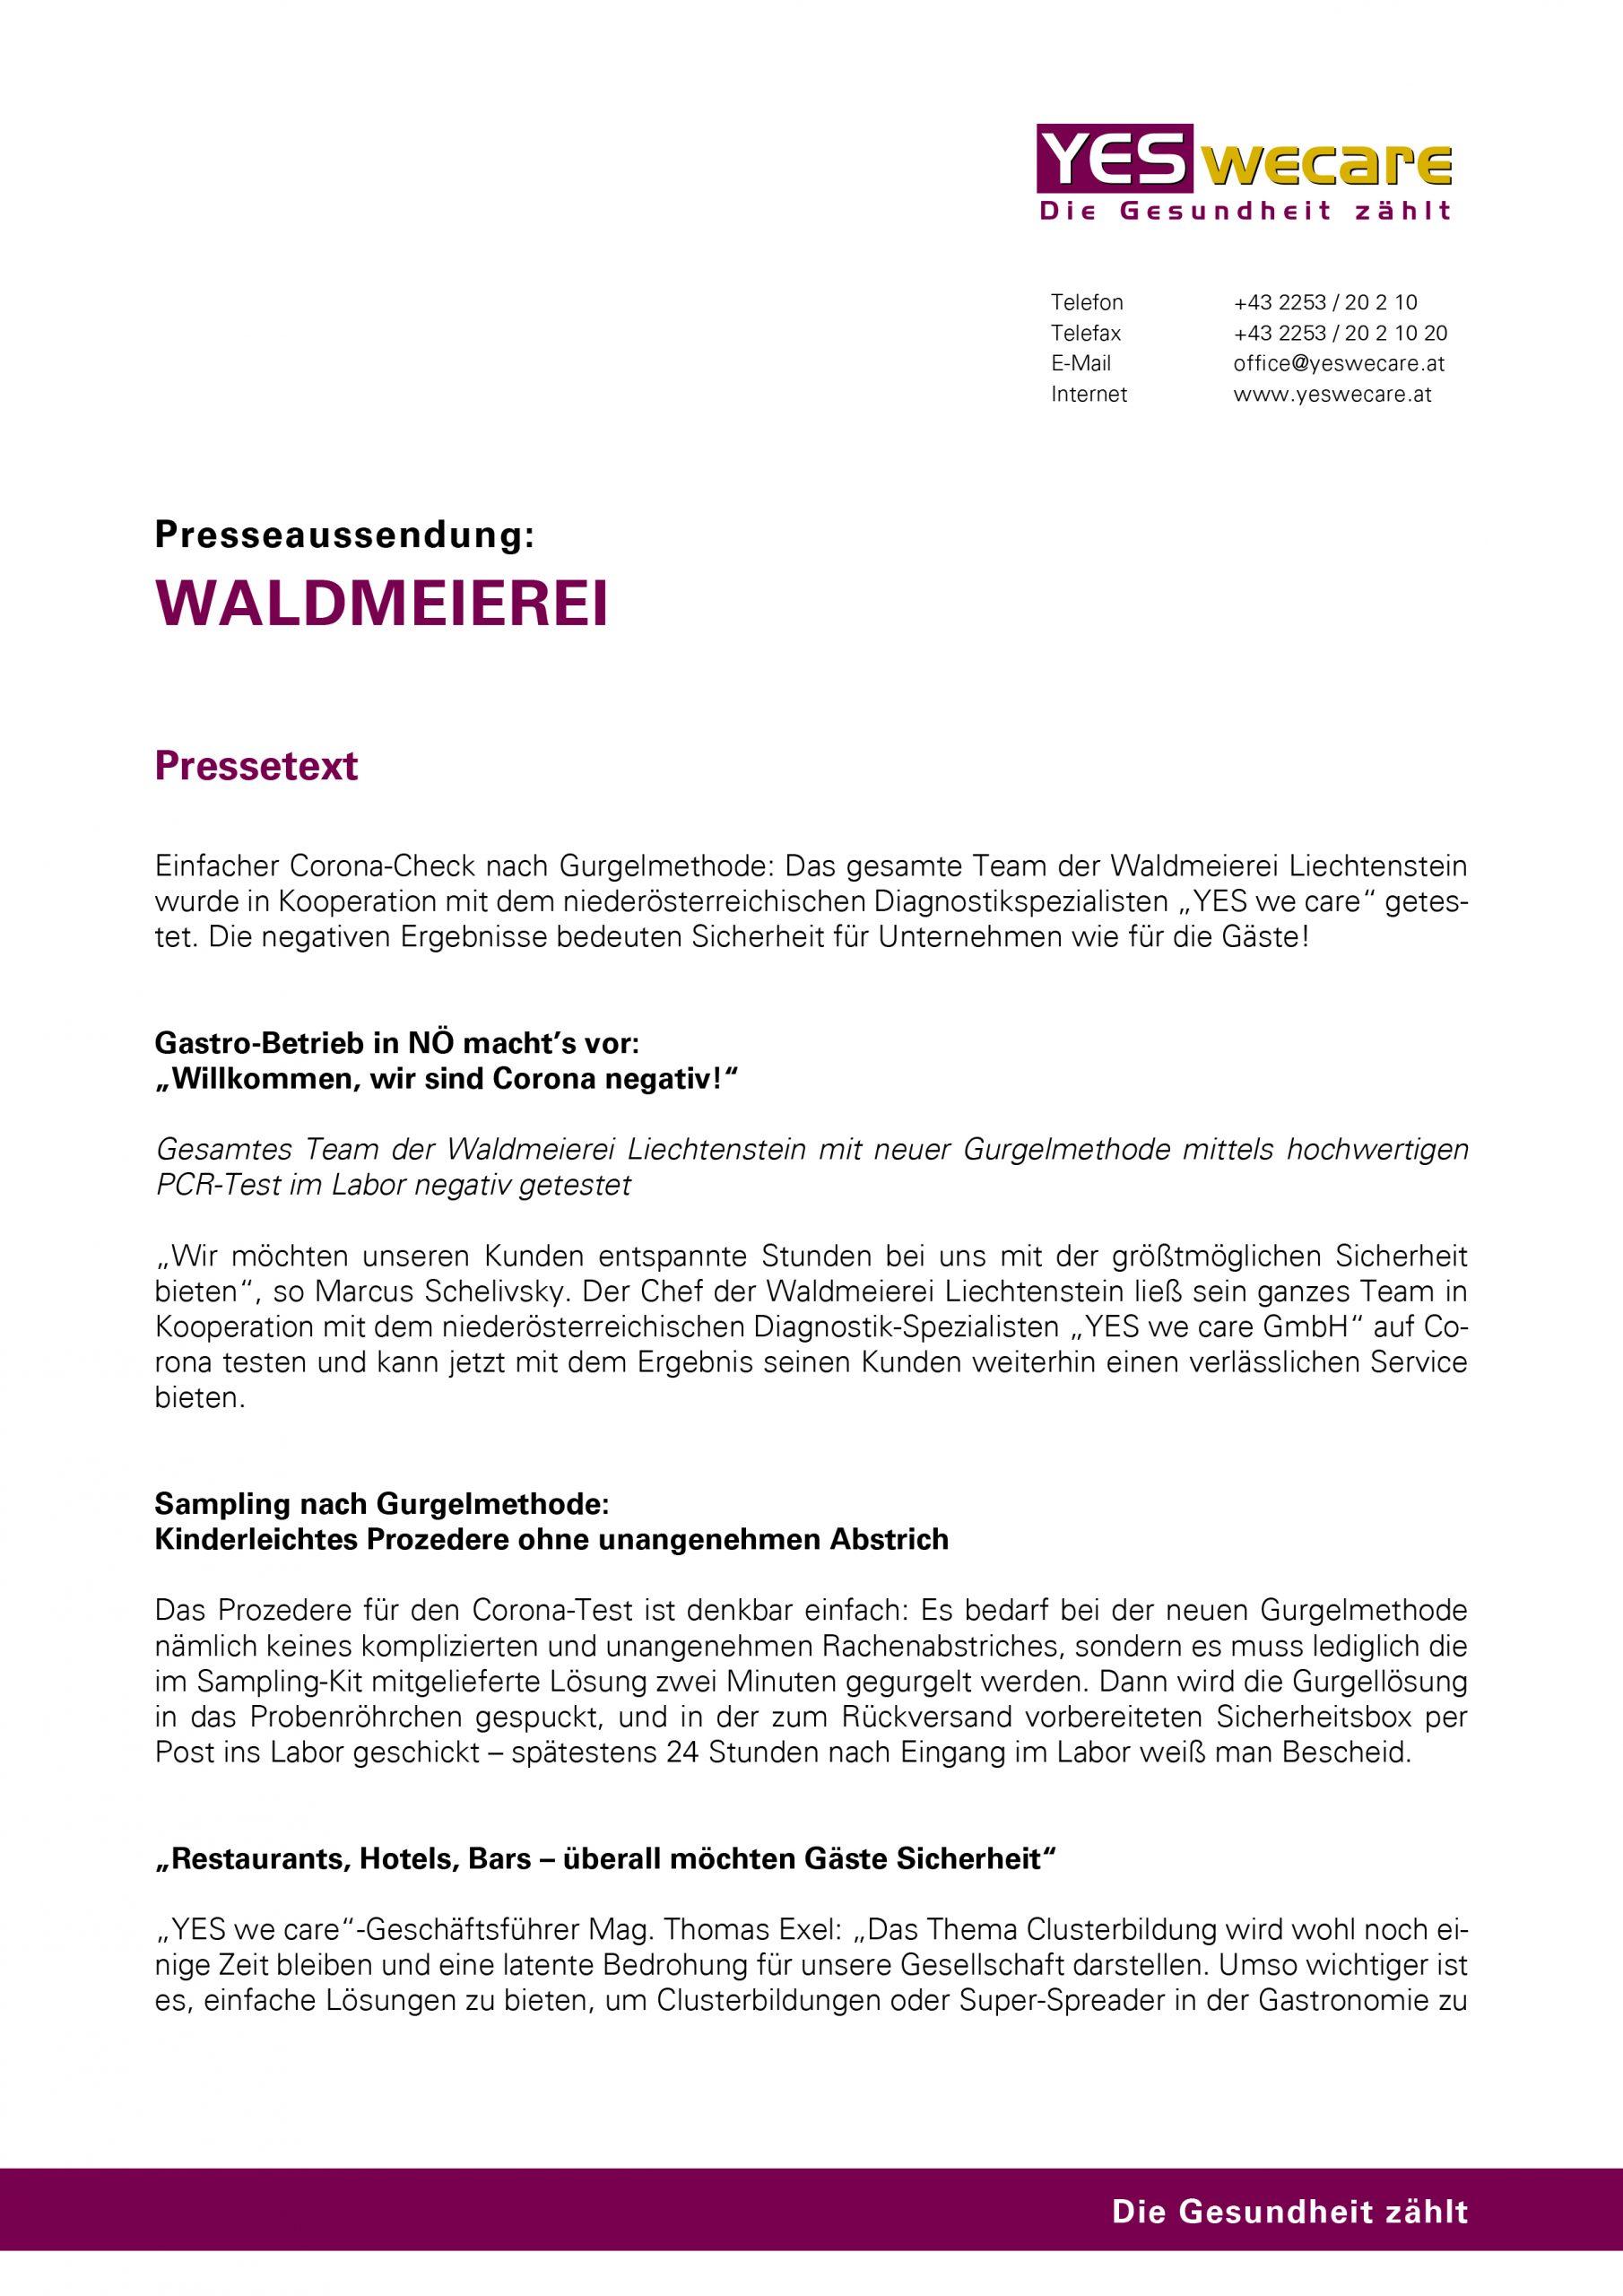 Presseaussendung_YES we care_Waldmeierei